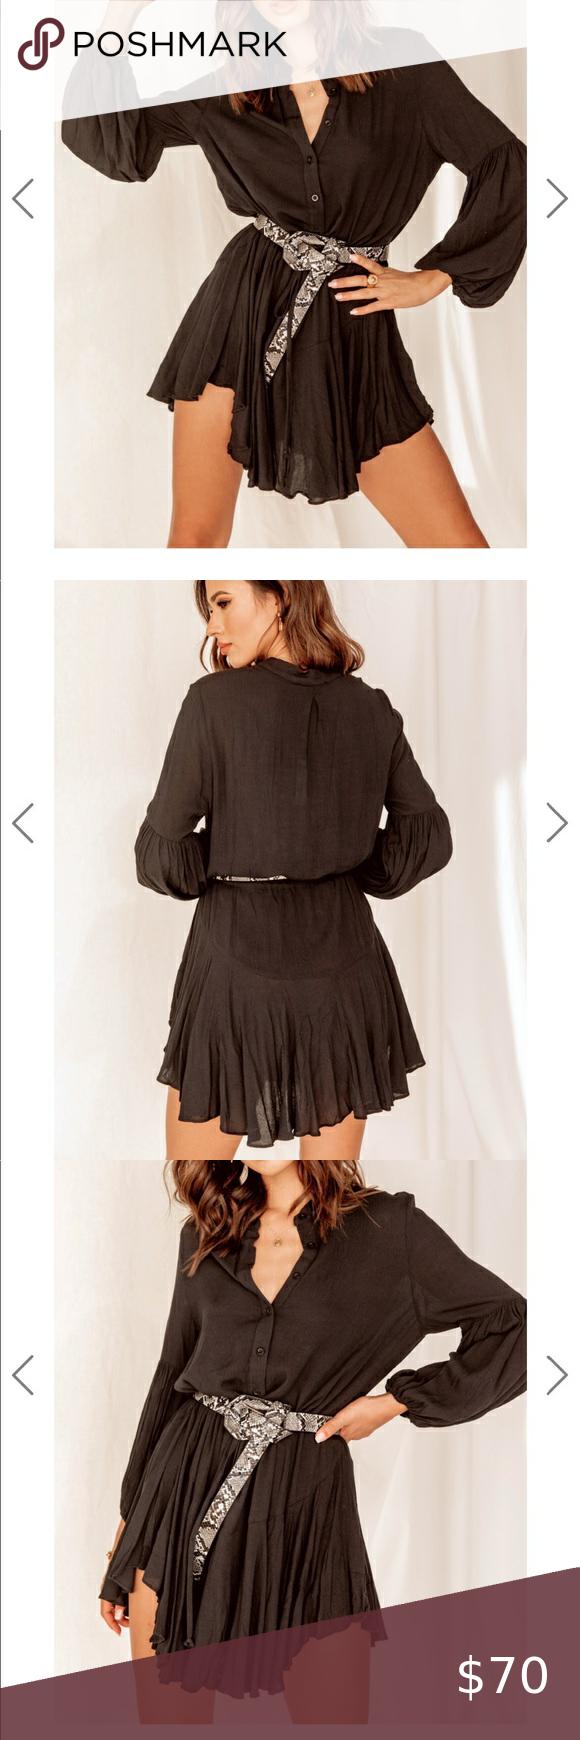 Black Long Sleeve Mini Dress Black Long Sleeve Mini Dress Black Long Sleeve Dress Long Sleeve Mini [ 1740 x 580 Pixel ]